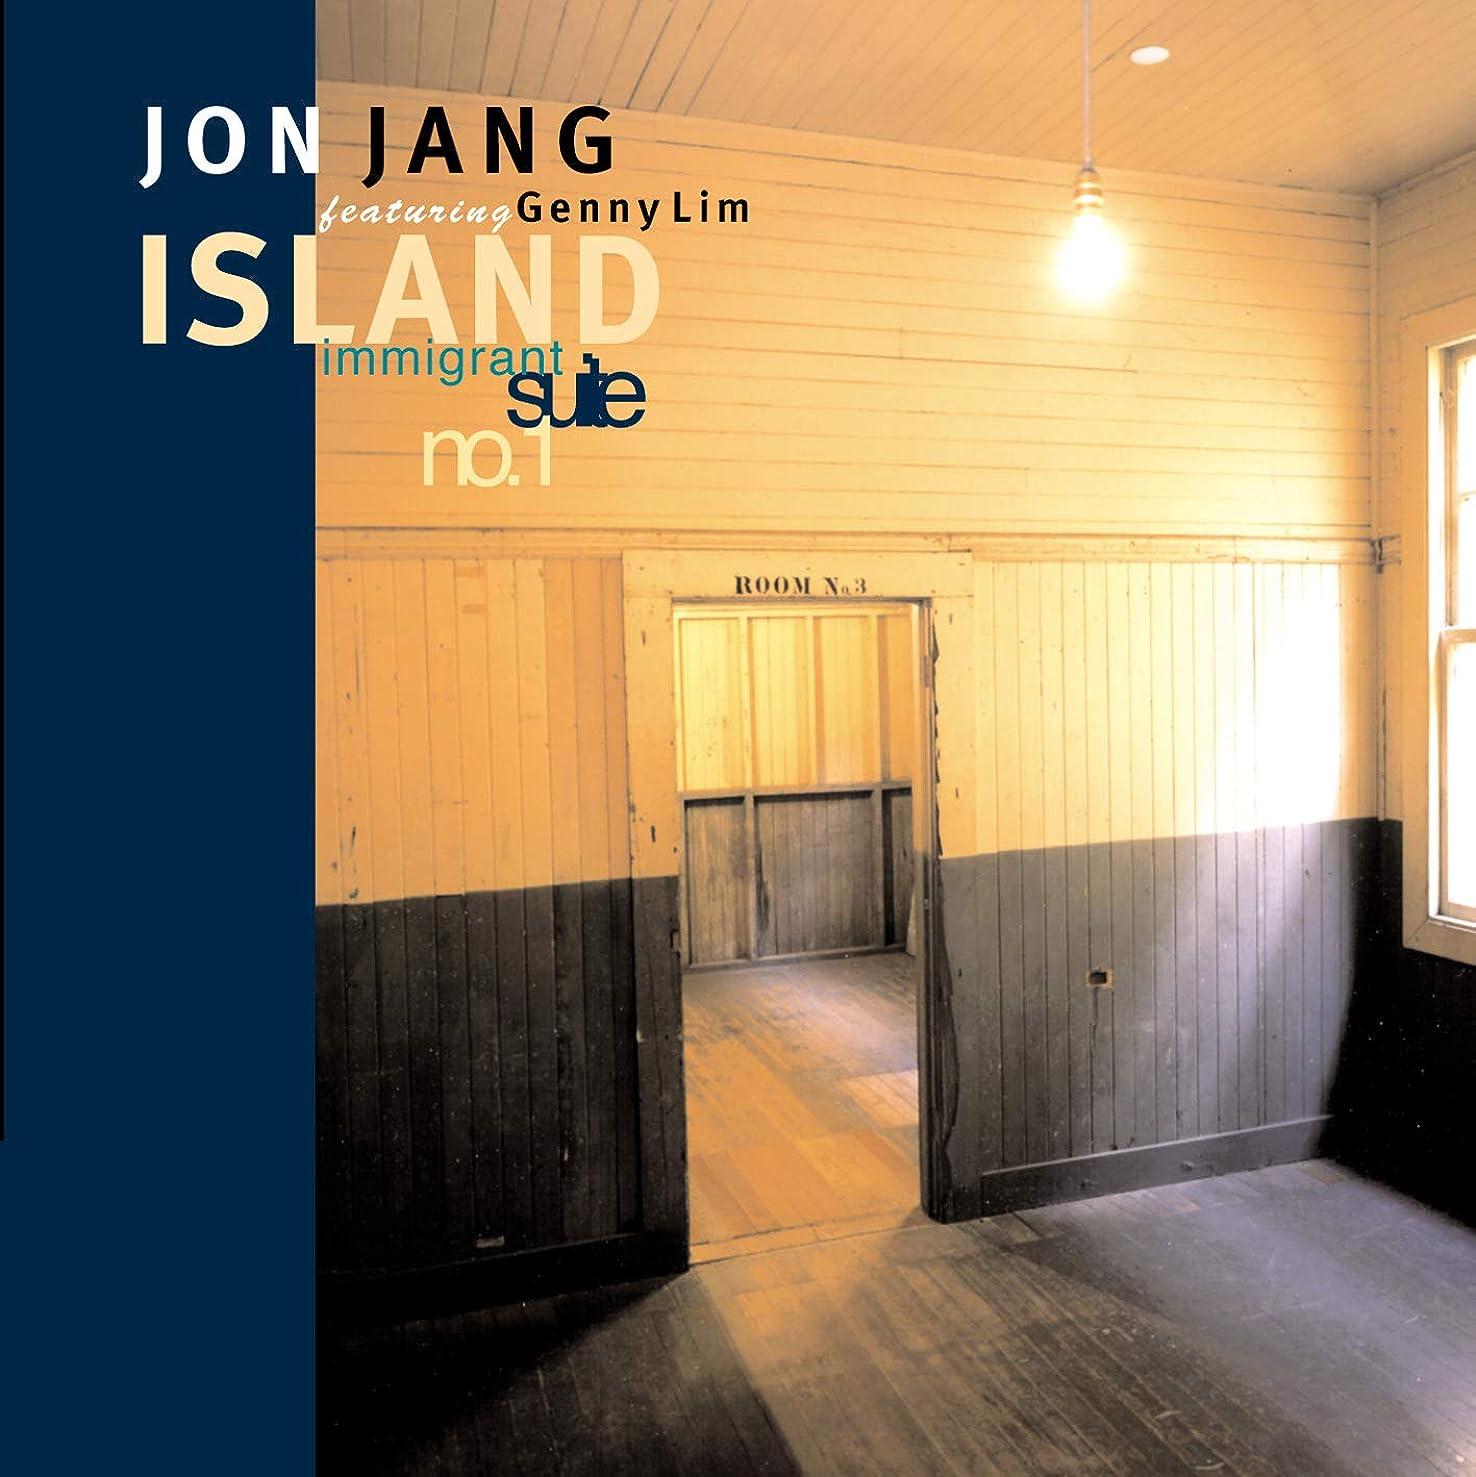 Island: The Immigrant Suite